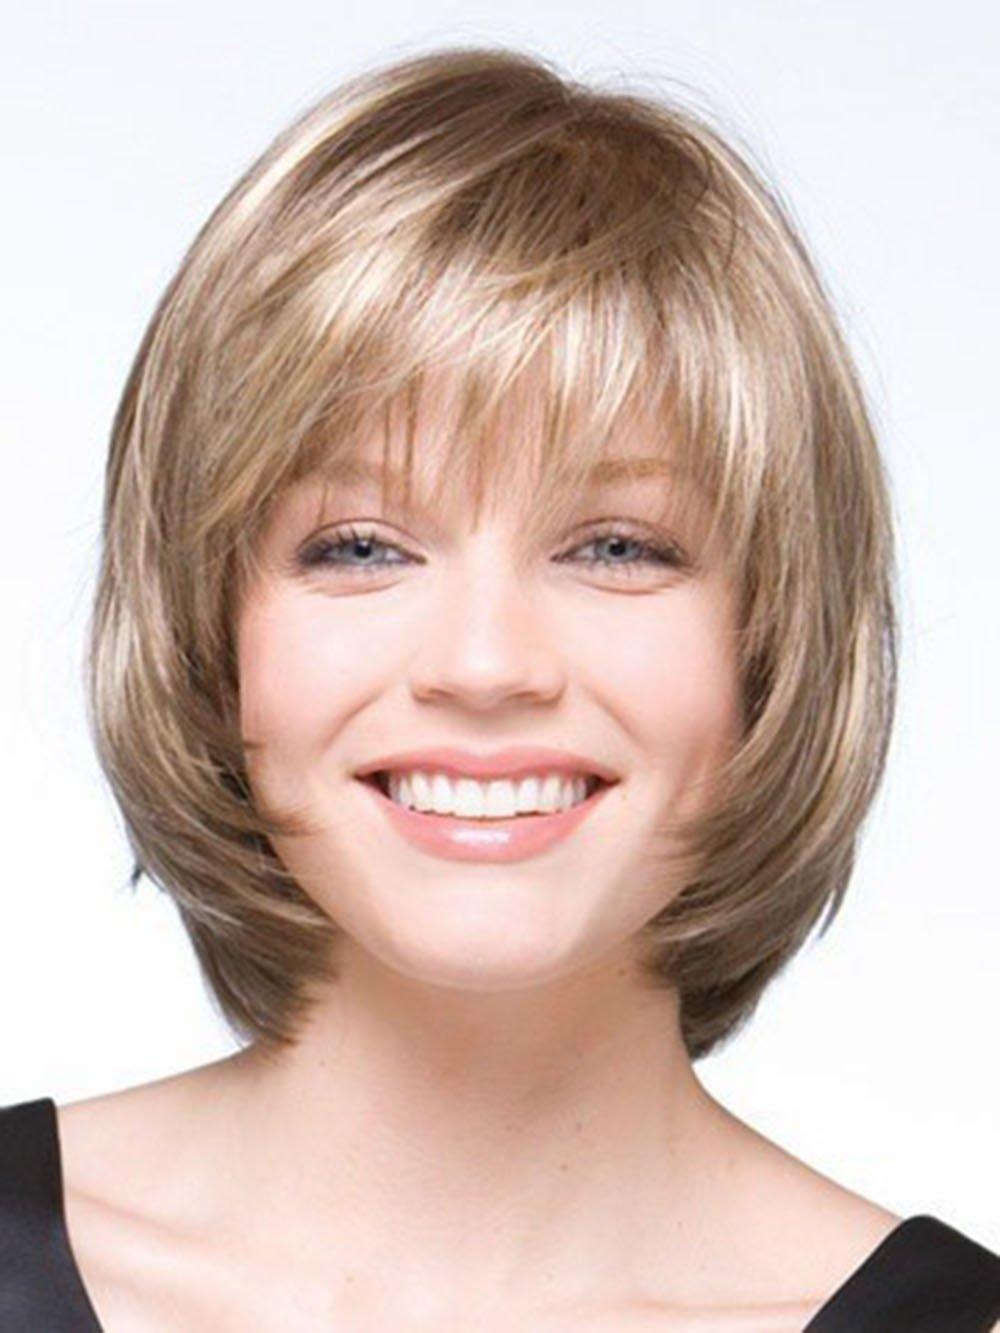 Amazon.com : 2015 Bob Short Straight Blonde Wig for Women ...